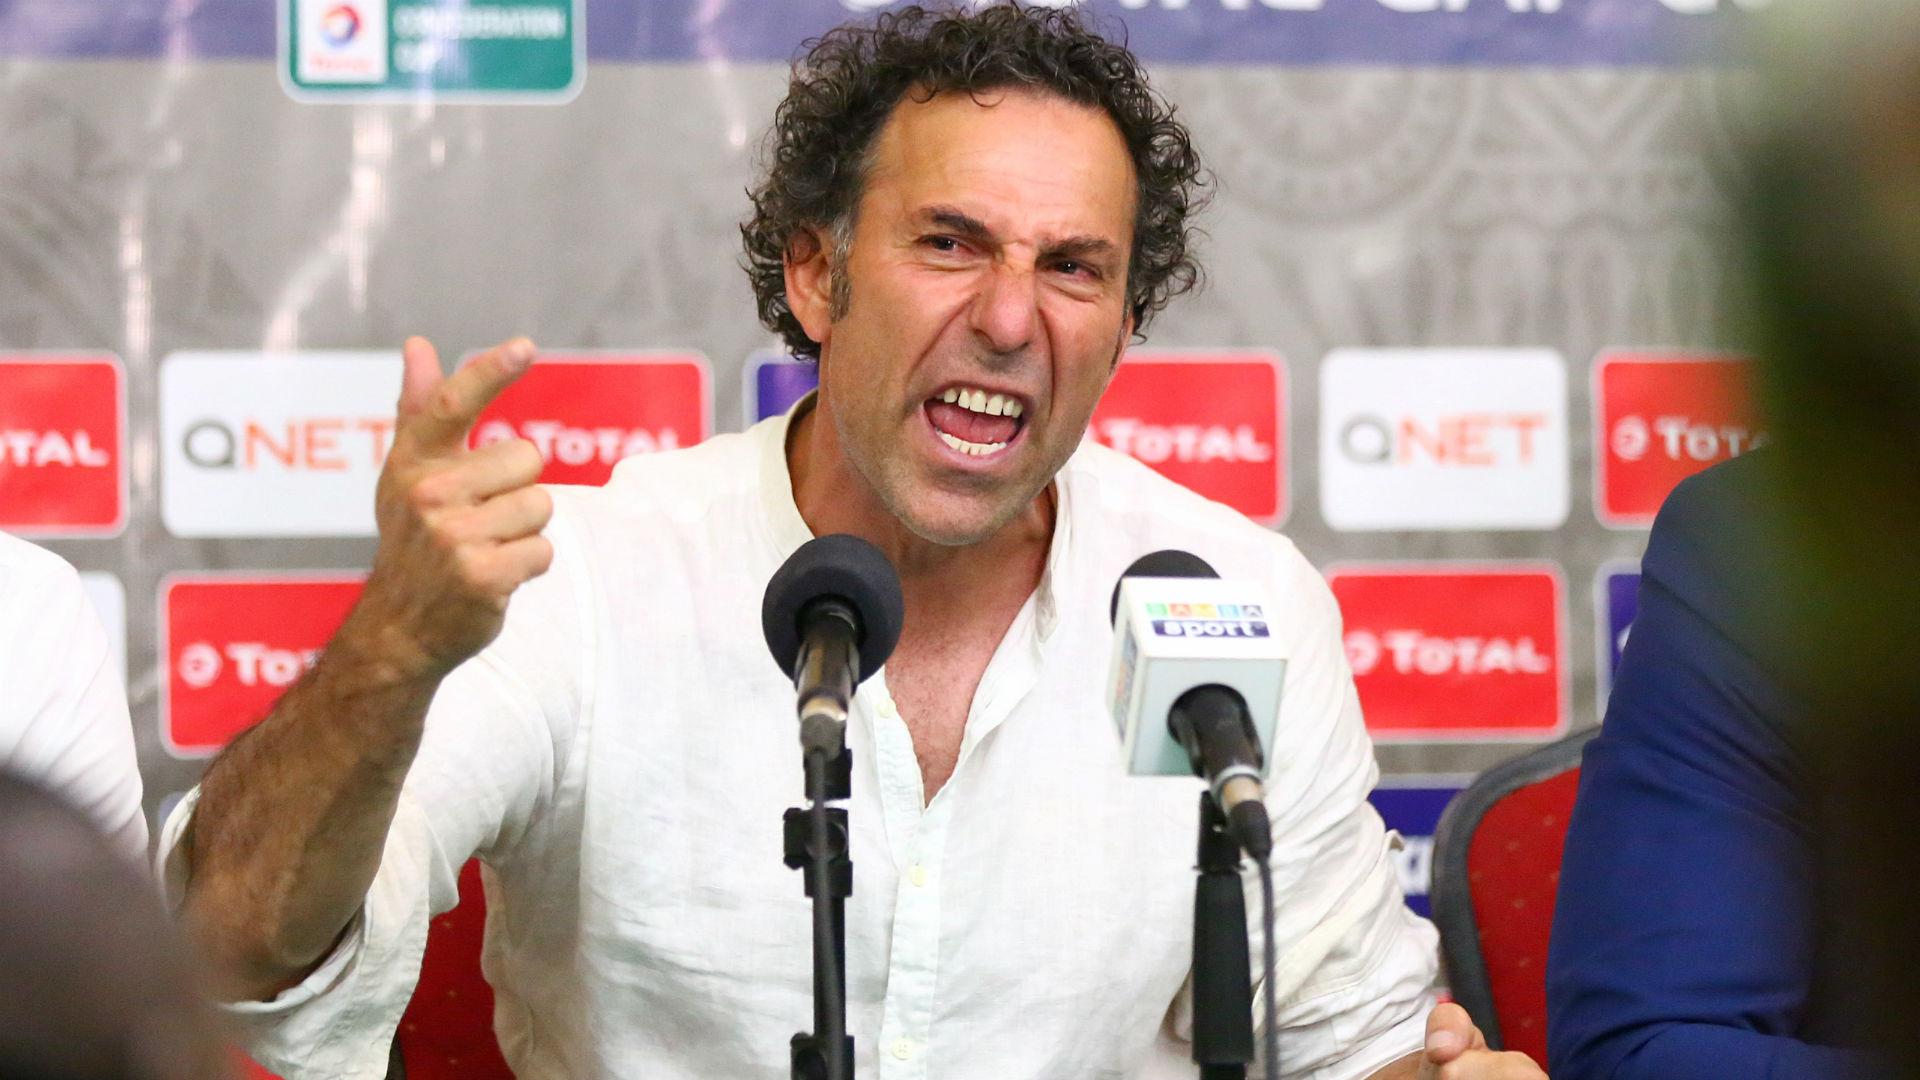 Gor Mahia coach Hassan Oktay.